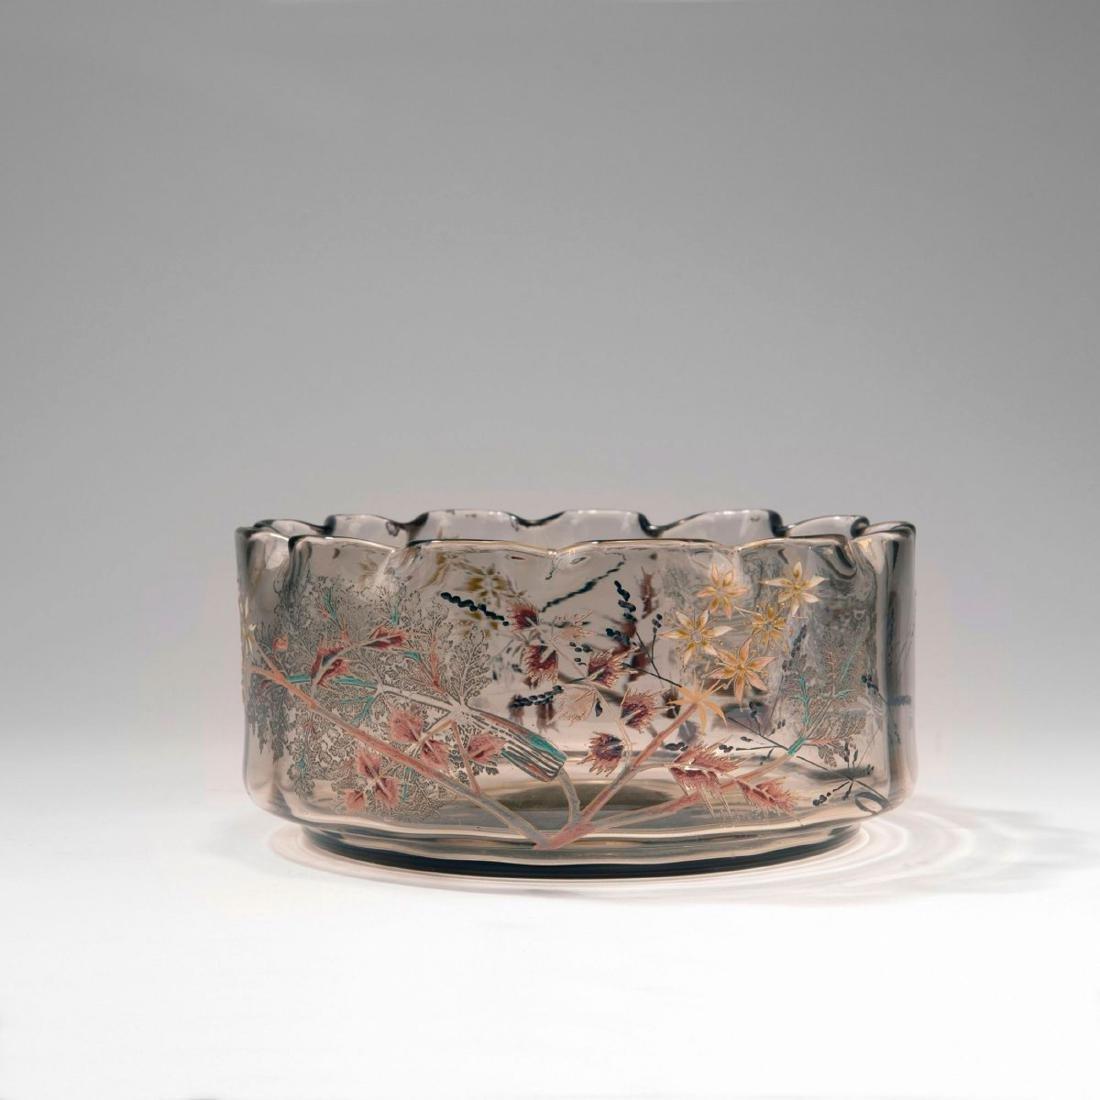 'Cerfeuil hérissé' bowl, 1889-95